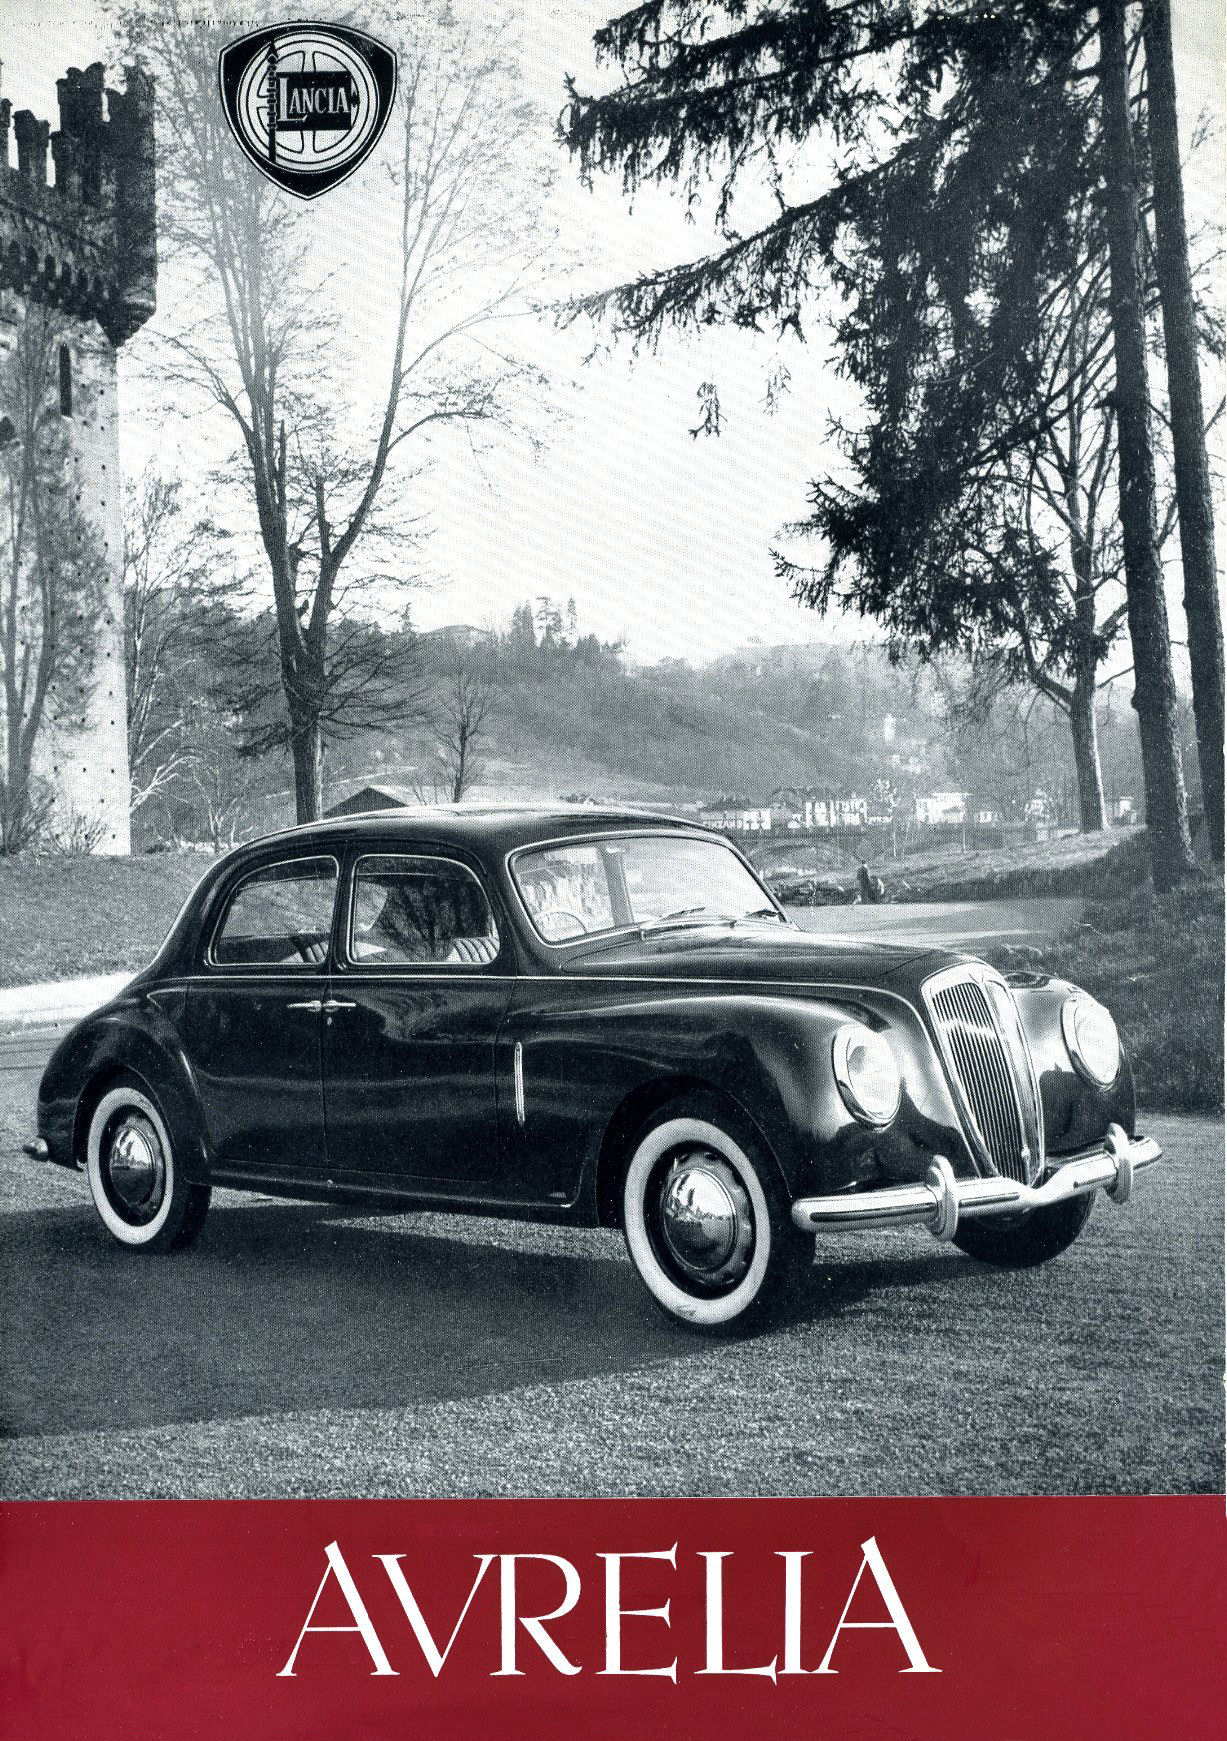 Old Cars Photos >> 1950-52 Lancia Aurelia brochure